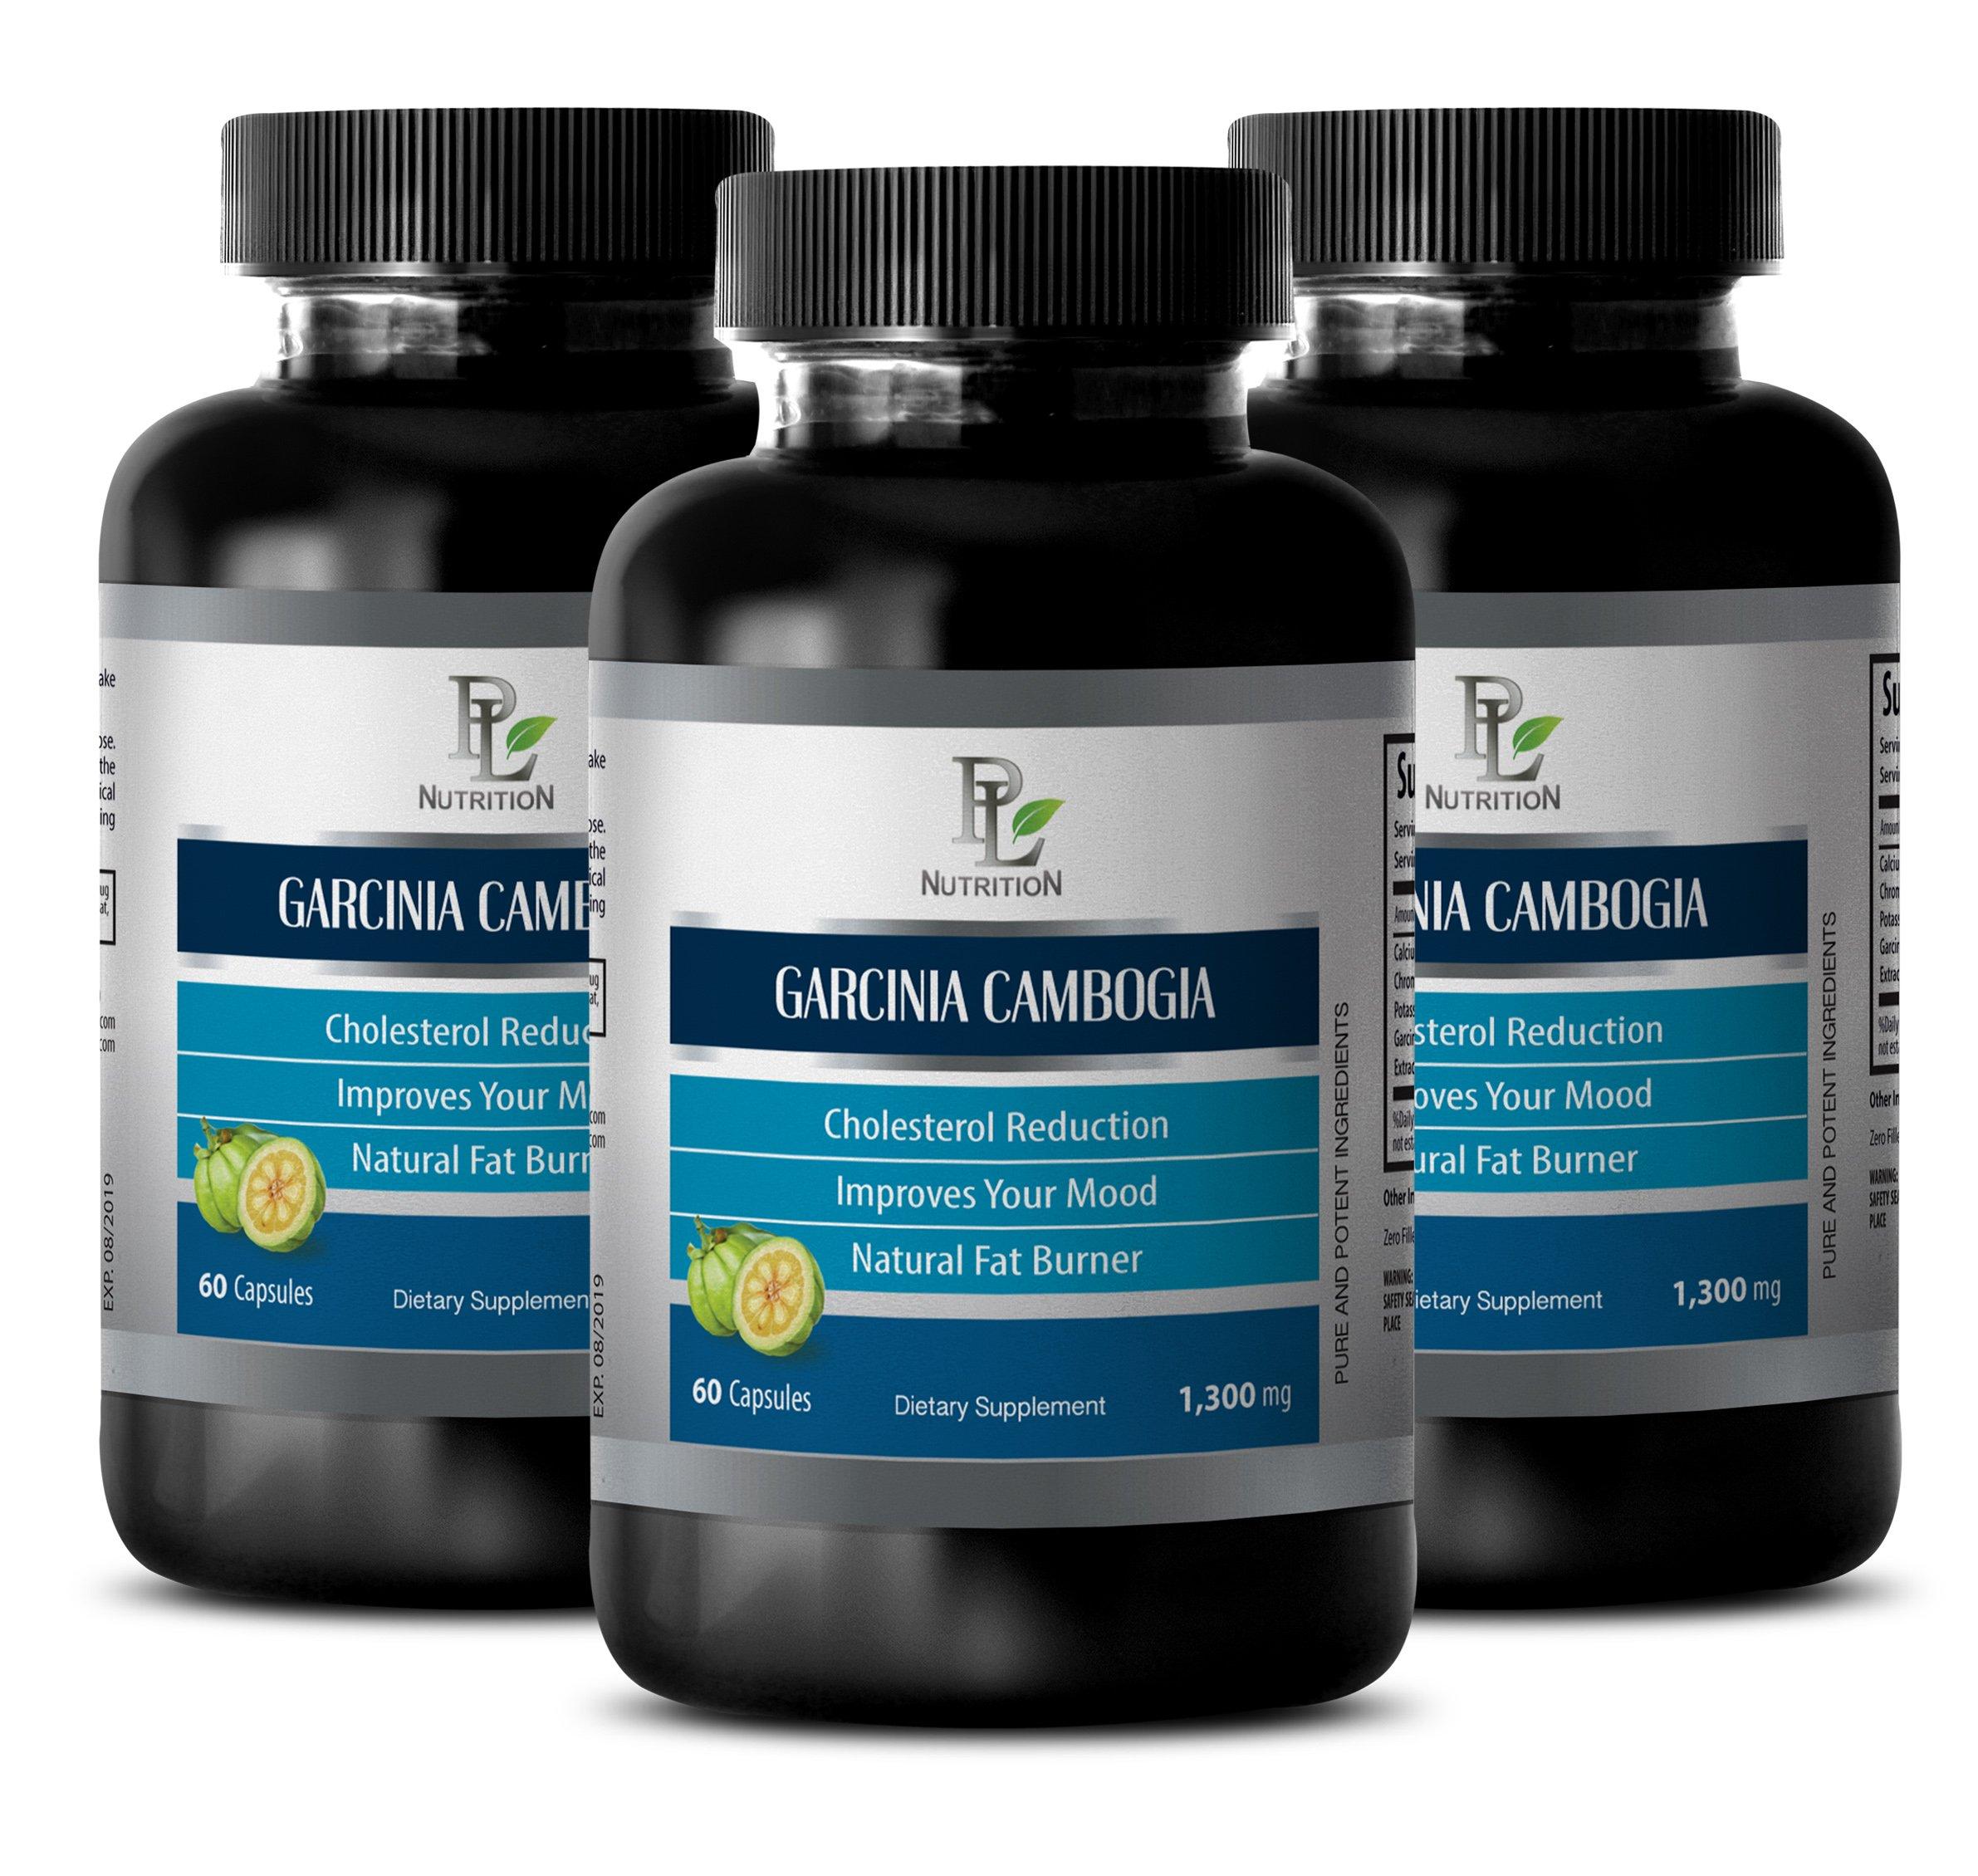 Supplements for metabolism - GARCINIA CAMBOGIA EXTRACT - Metabolism pills - 3 Bottle 180 Capsules